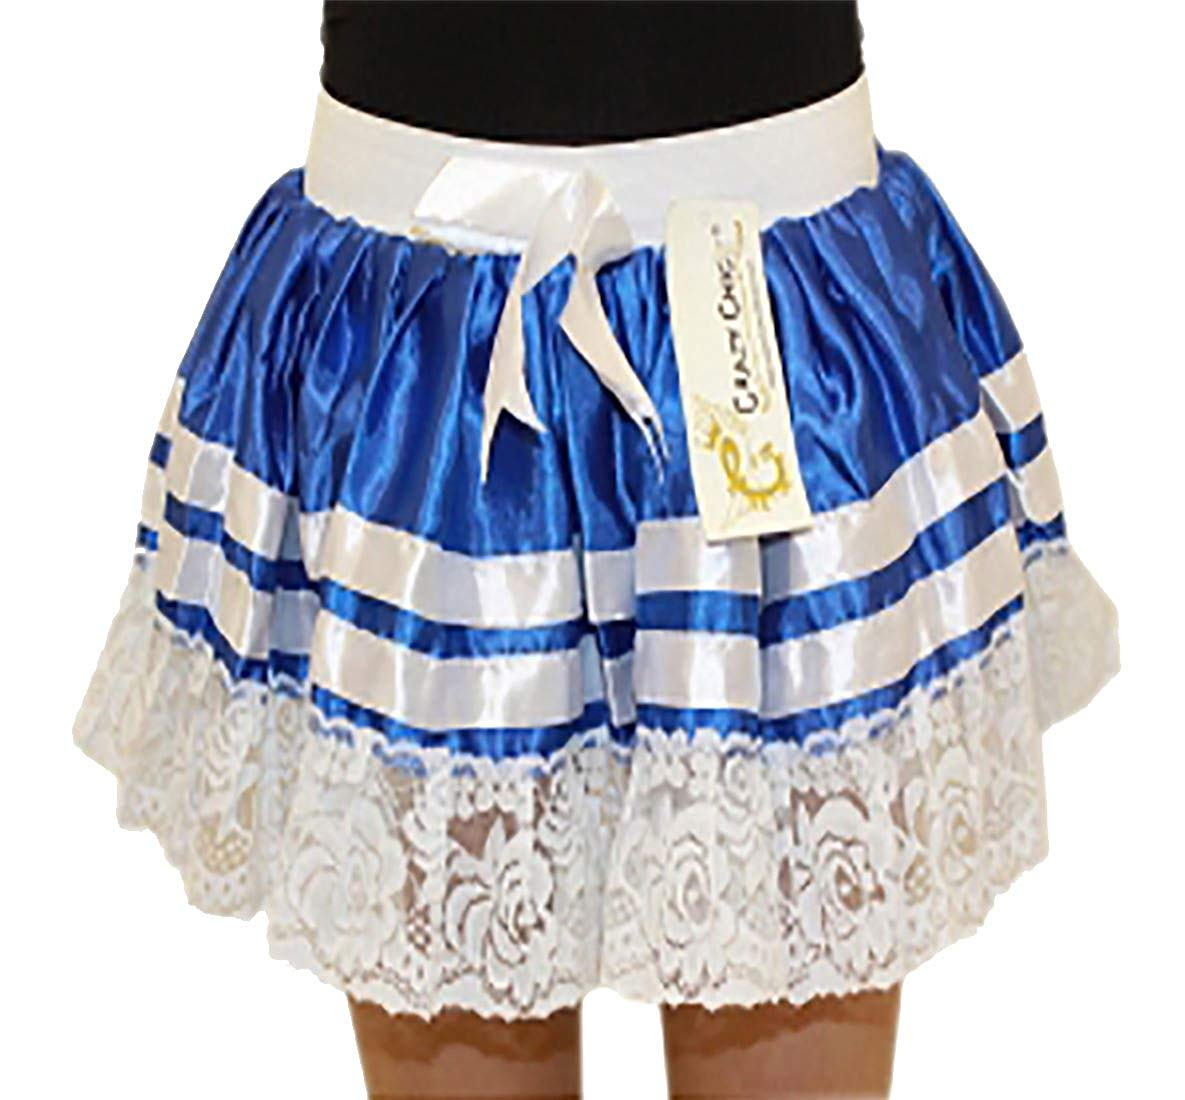 Rimi Hanger Girls 3 Layers Sailor Tutu Mini Skirt Childrens Fancy Dress Party Wear Skirt One Size (5-10 Years)